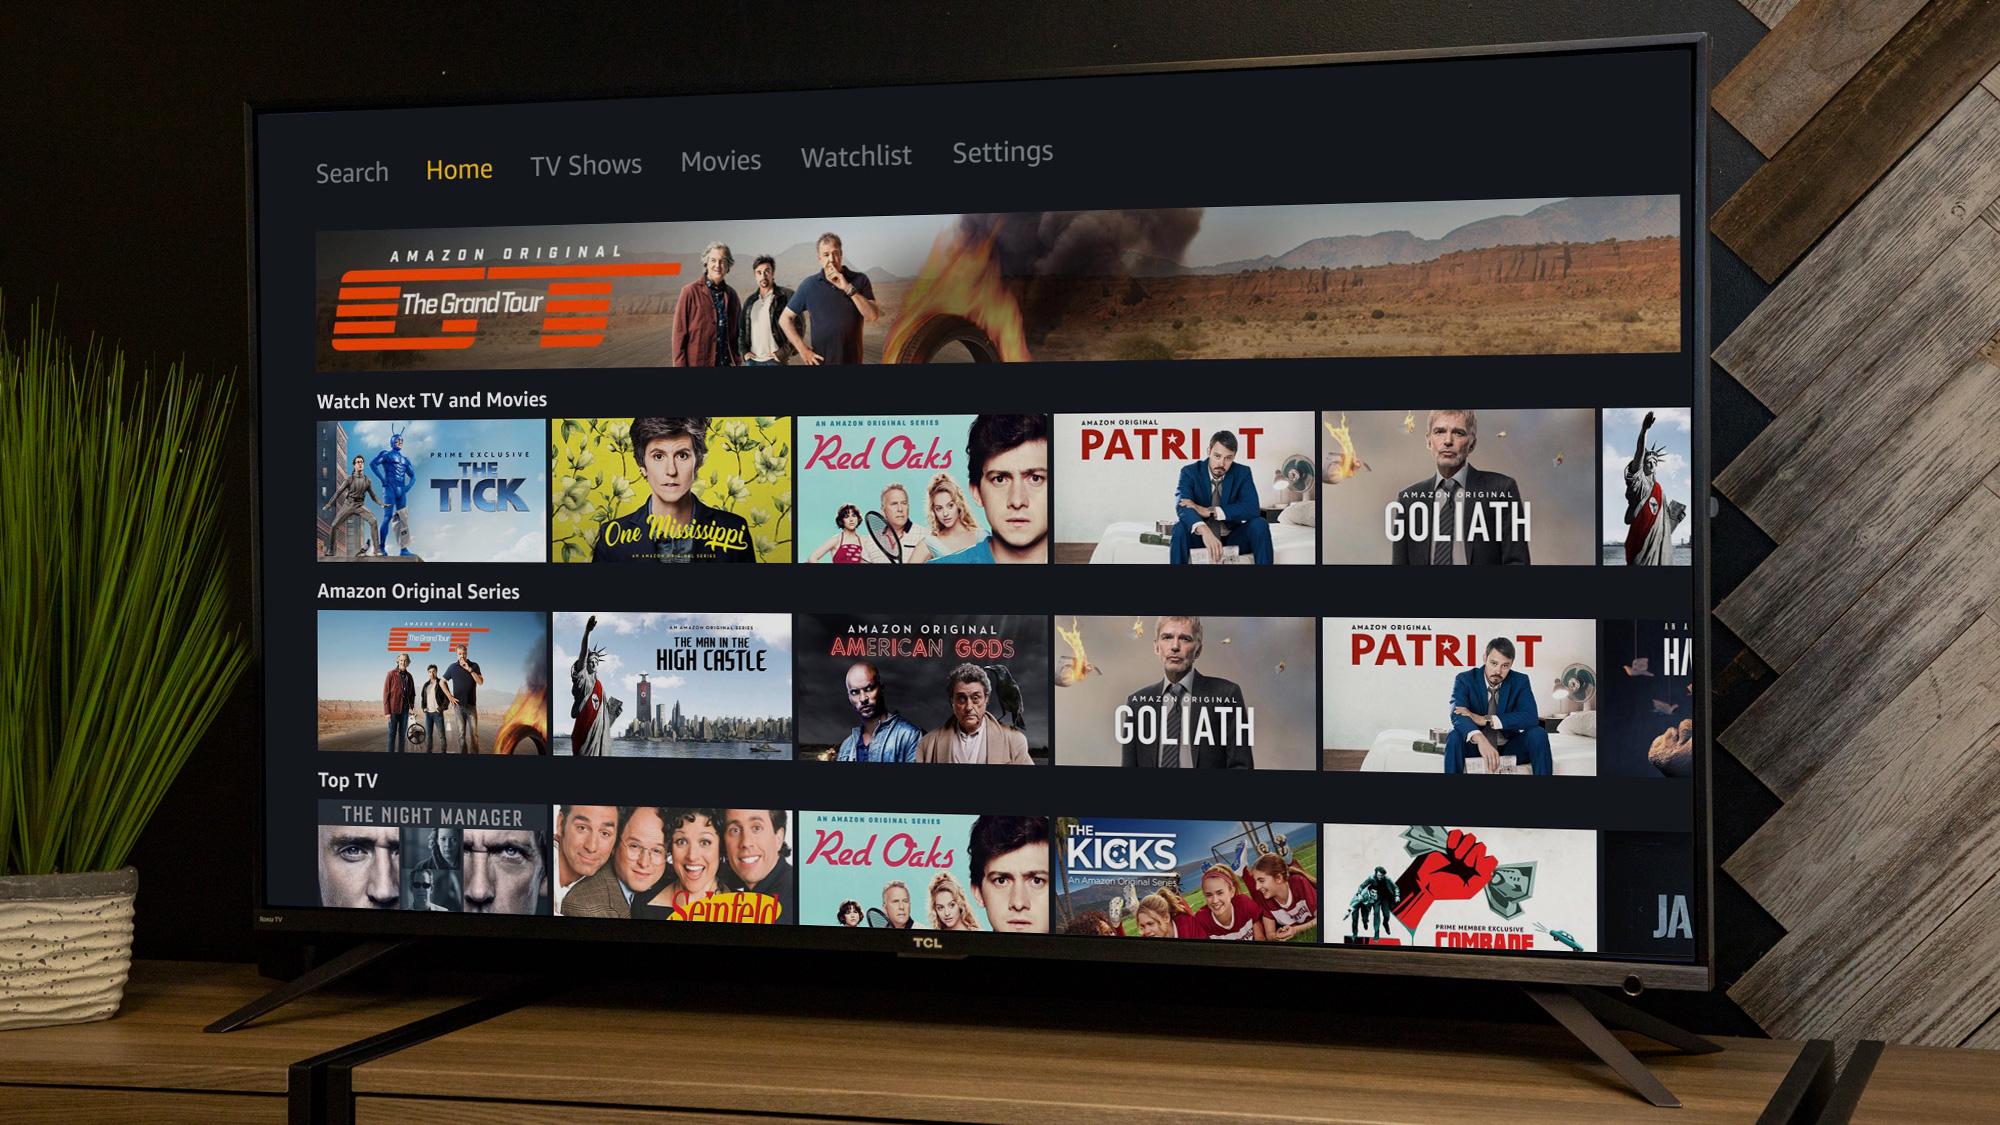 Best streaming service: Amazon Prime